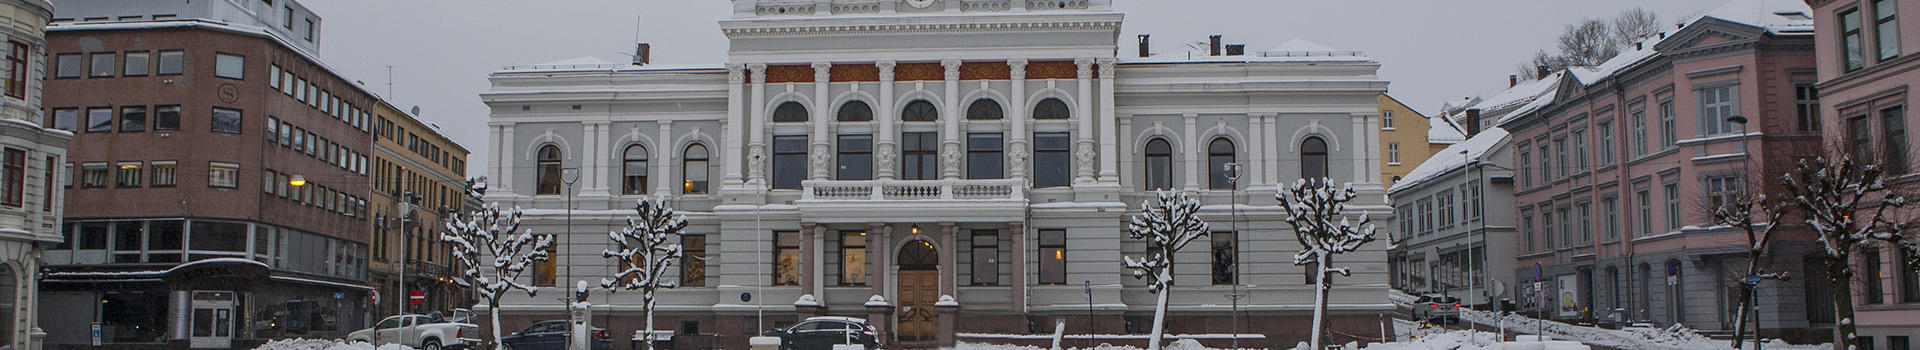 Rådhuset i Skien kommune